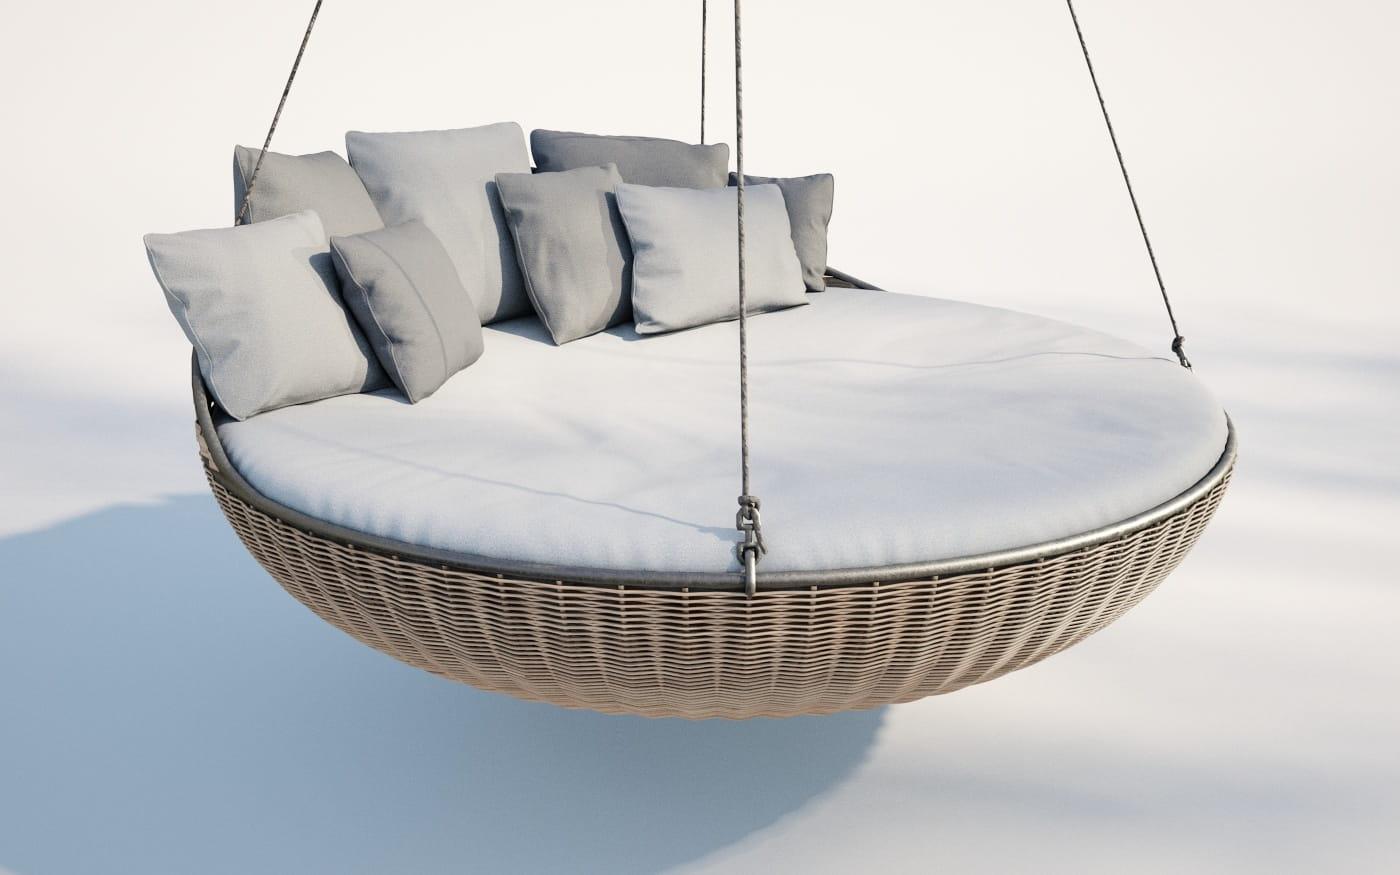 Furniture 21 AM220 Archmodels